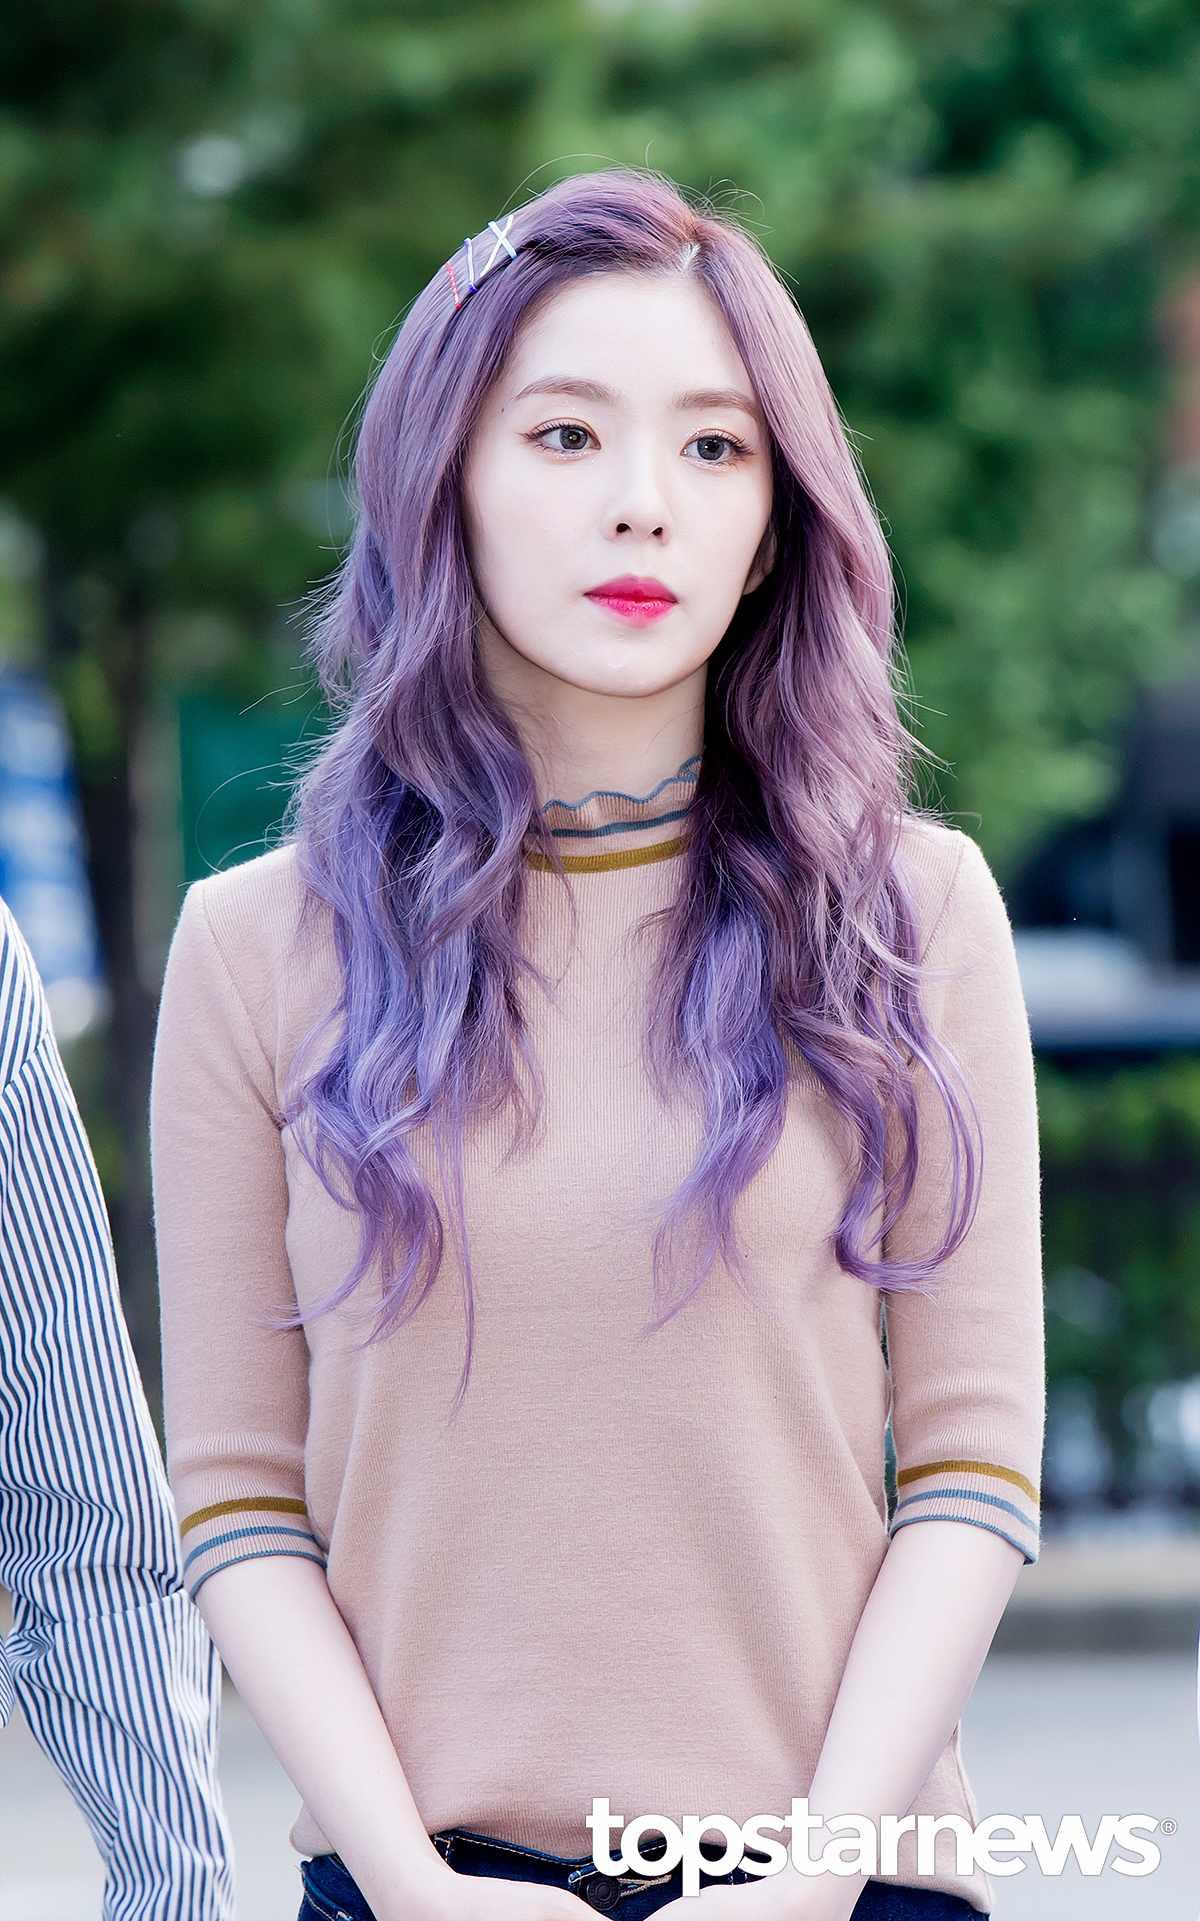 TOP 3  Red Velvet Irene (16%) 完全童顏的 Irene 91年生已經25歲了!!!因為擁有仙女般的外貌廣為人知~~~